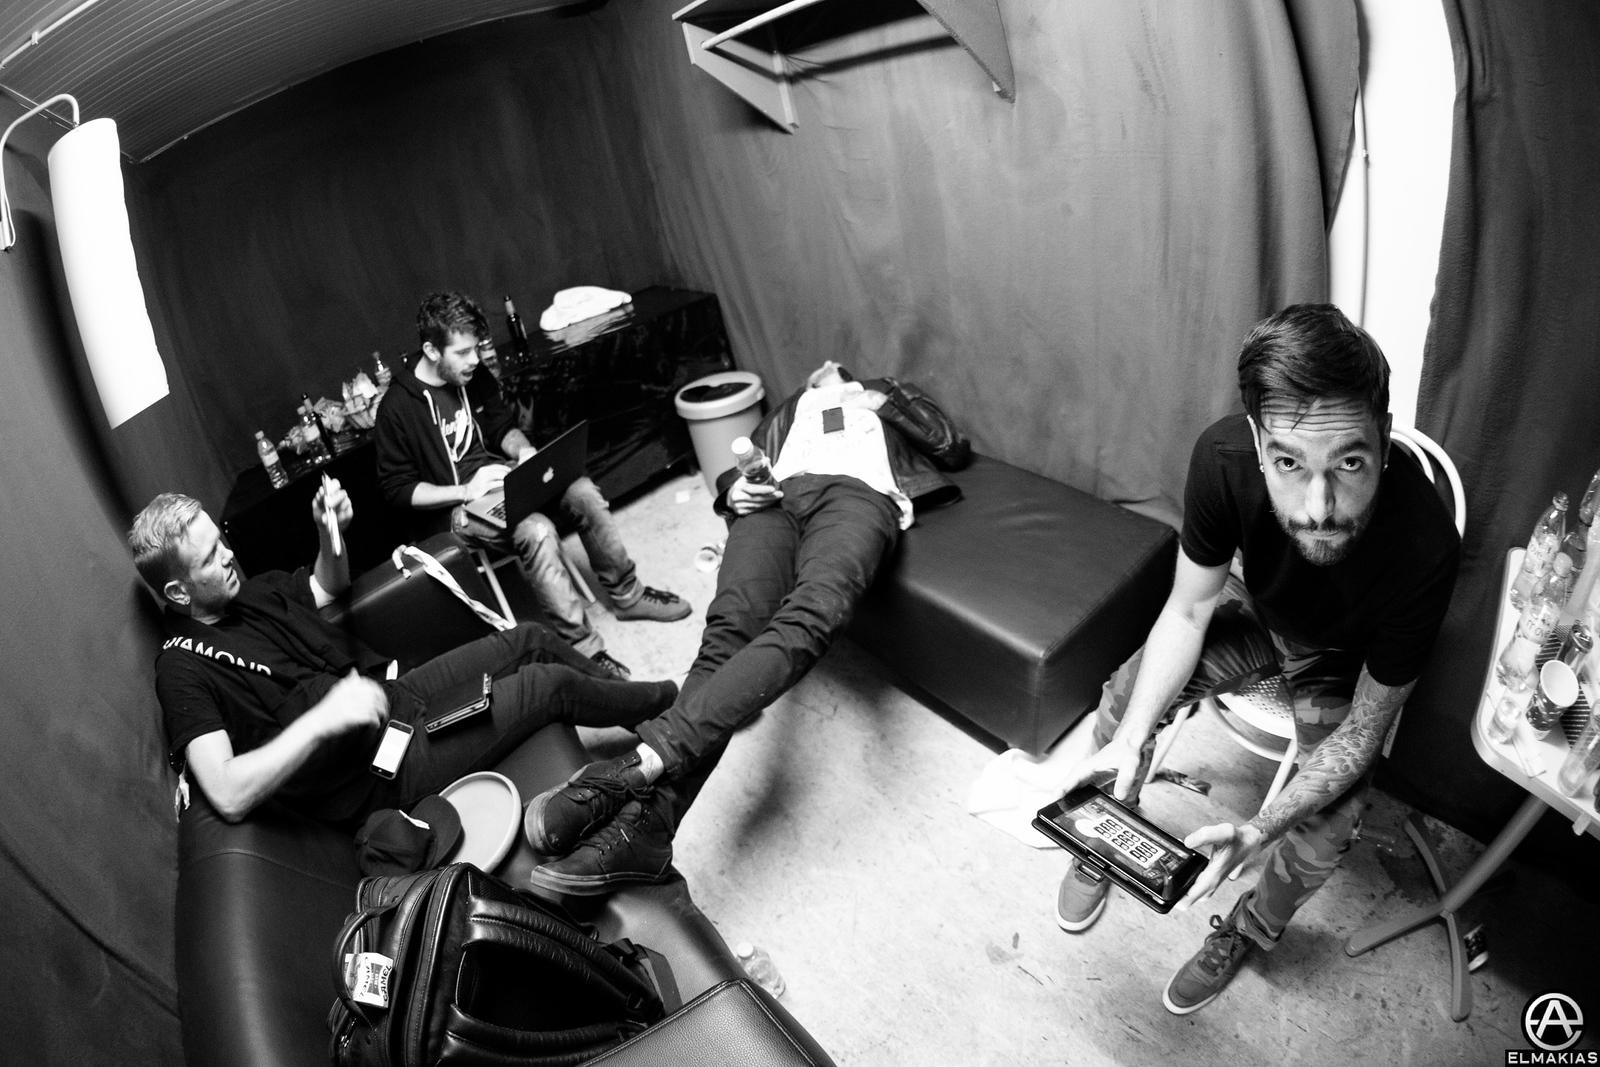 backstage hanging in Switzerland